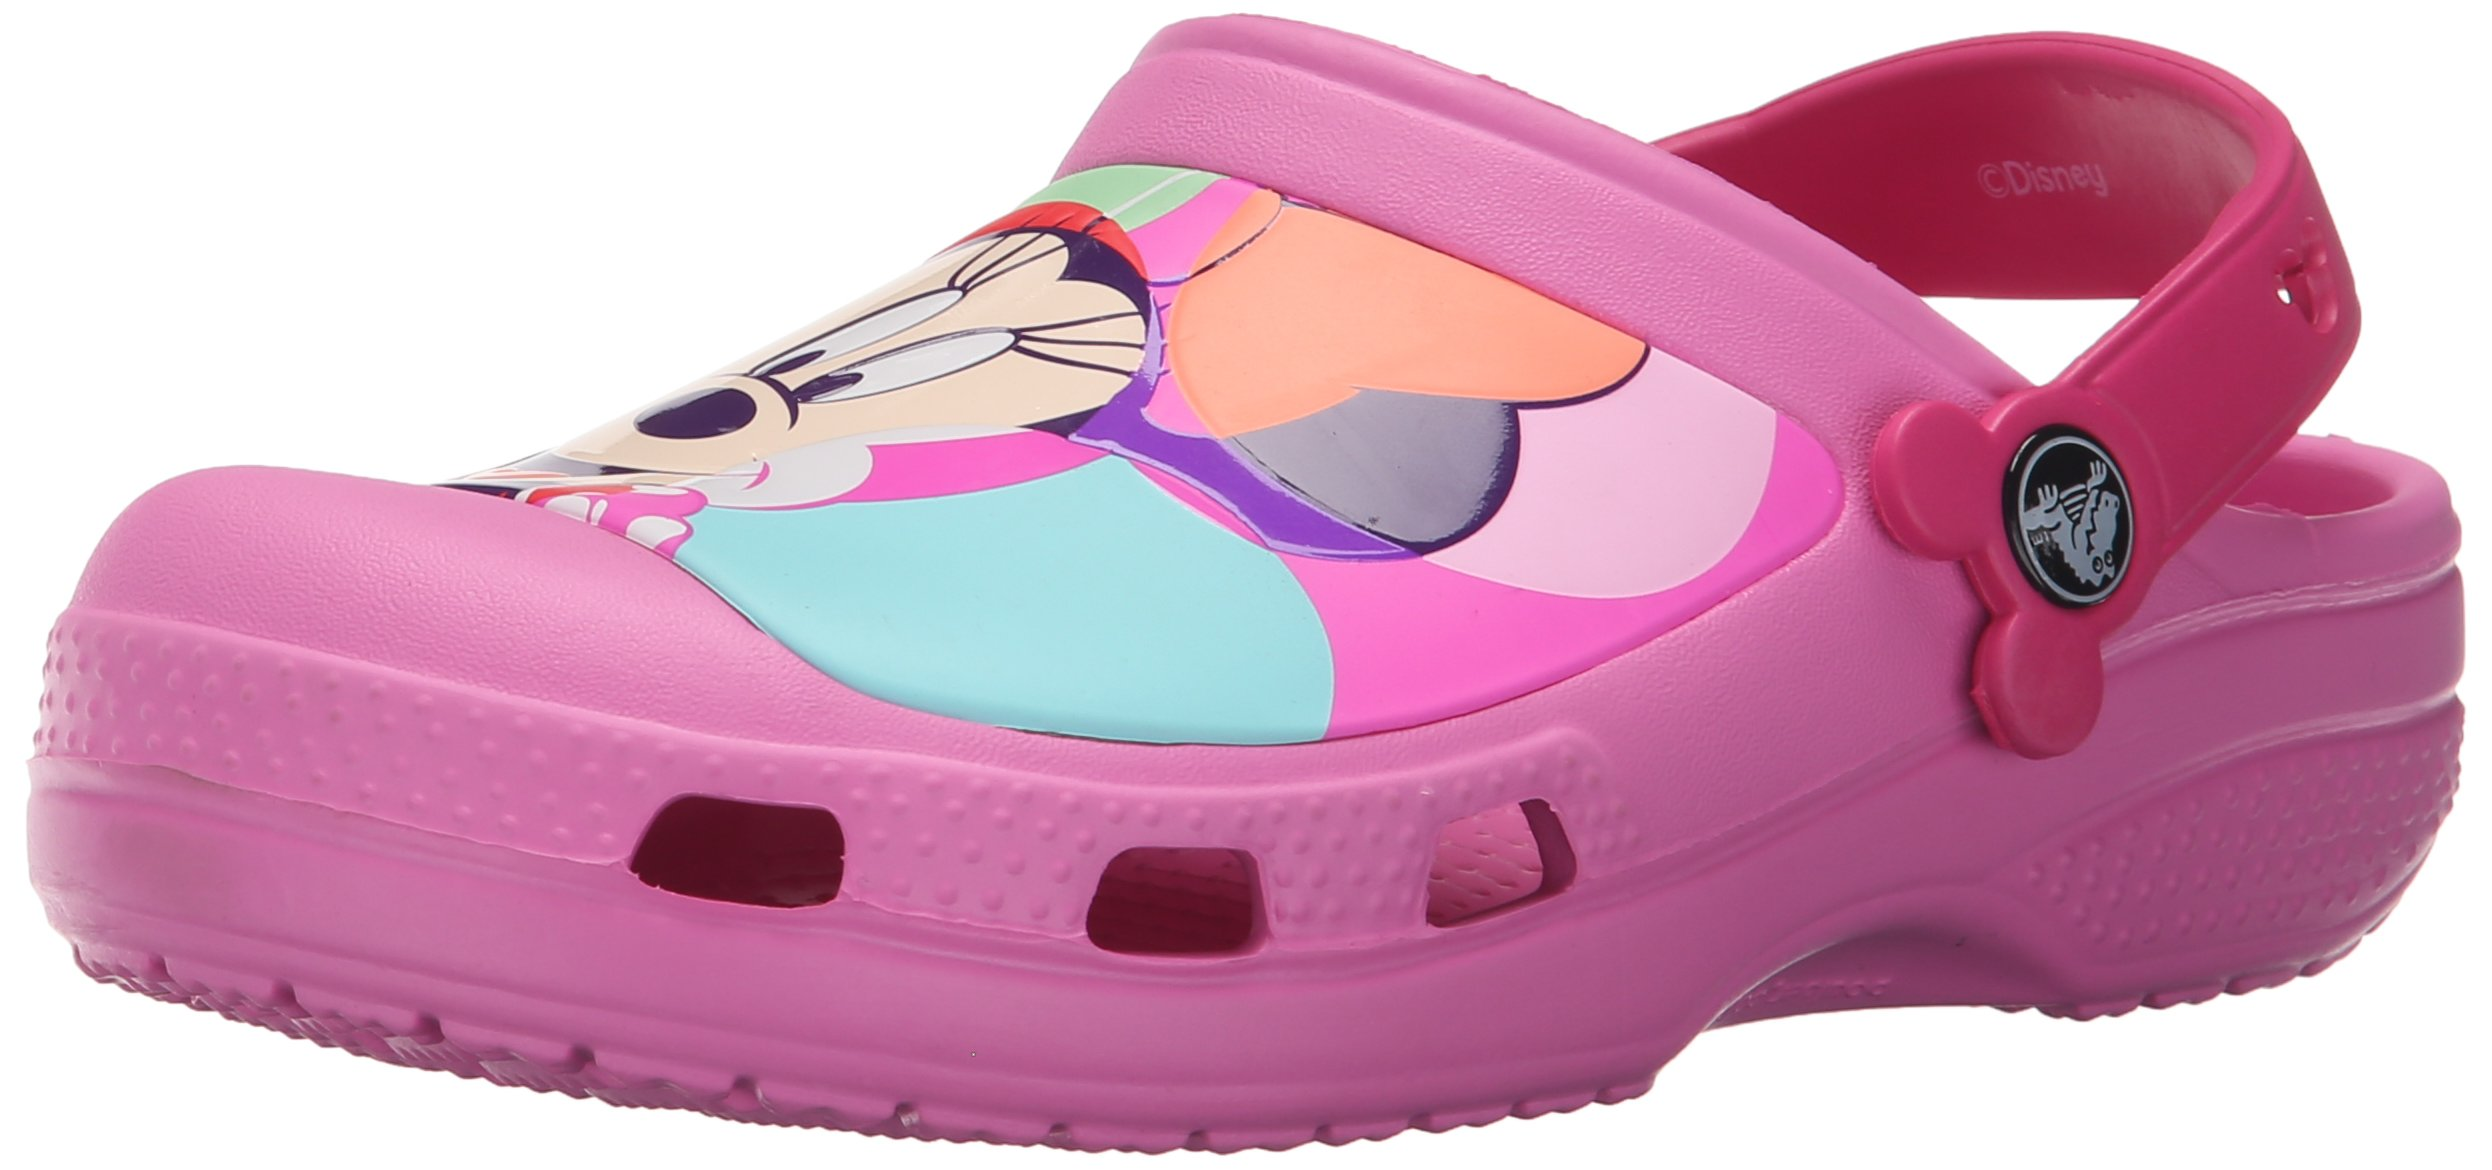 Crocs CC Colorblock K Minnie Licensed Clog (Toddler/Little Kid), Party Pink, 12 M US Little Kid/13 M US Little Kid